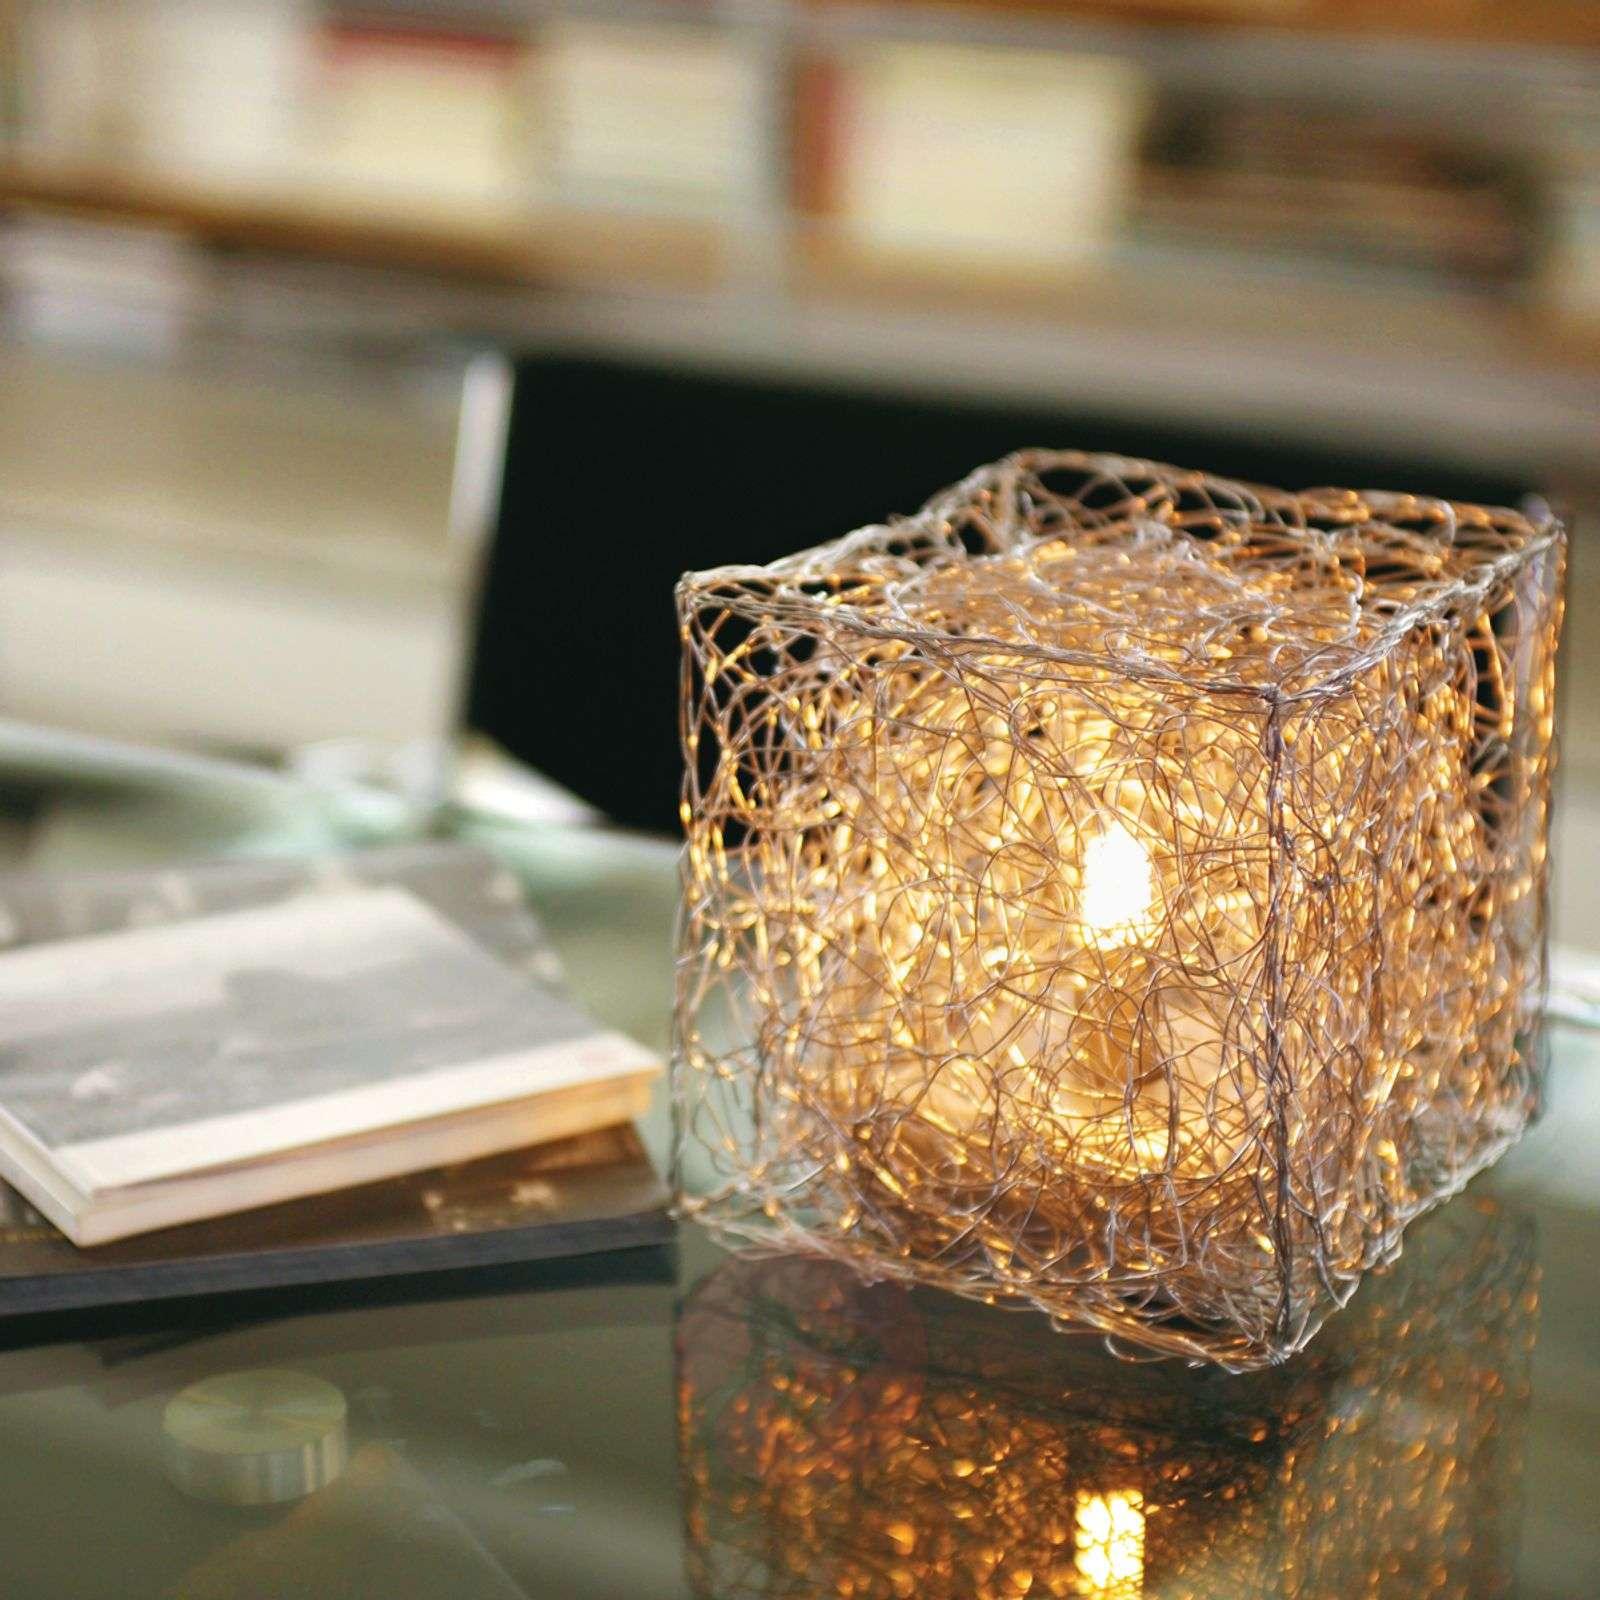 Knikerboker Qubetto cube-shaped table lamp-5538040-01